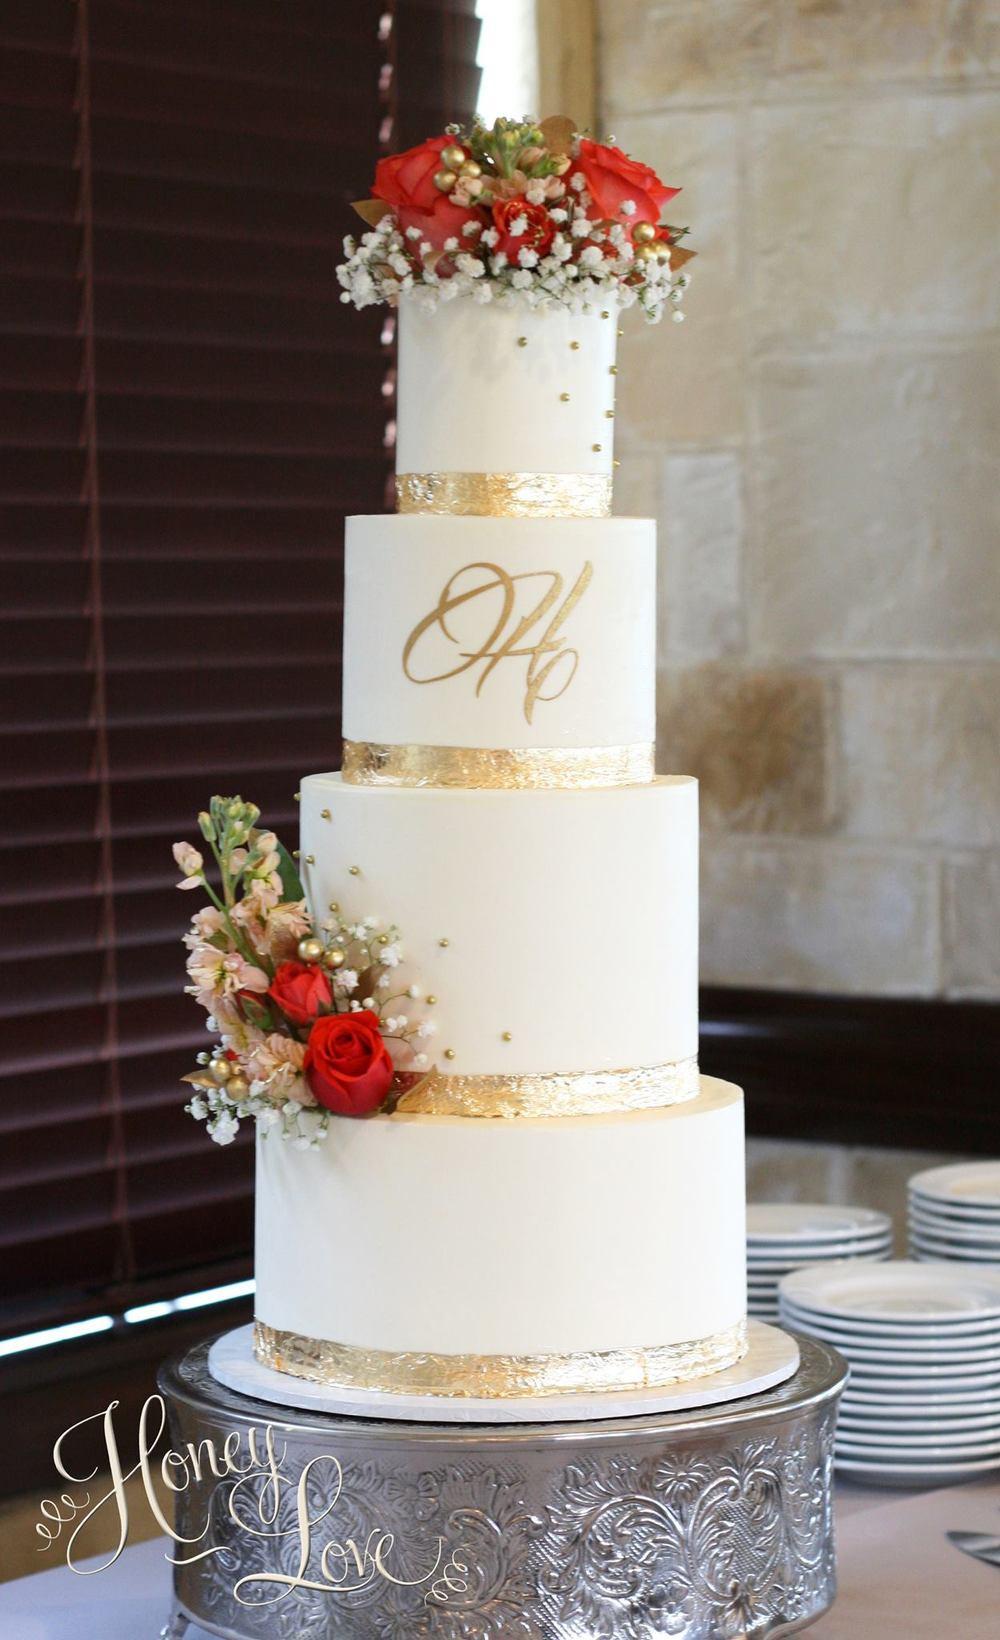 Wedding Cakes With Gold Accents  Wedding Cakes — HoneyLove Cakery